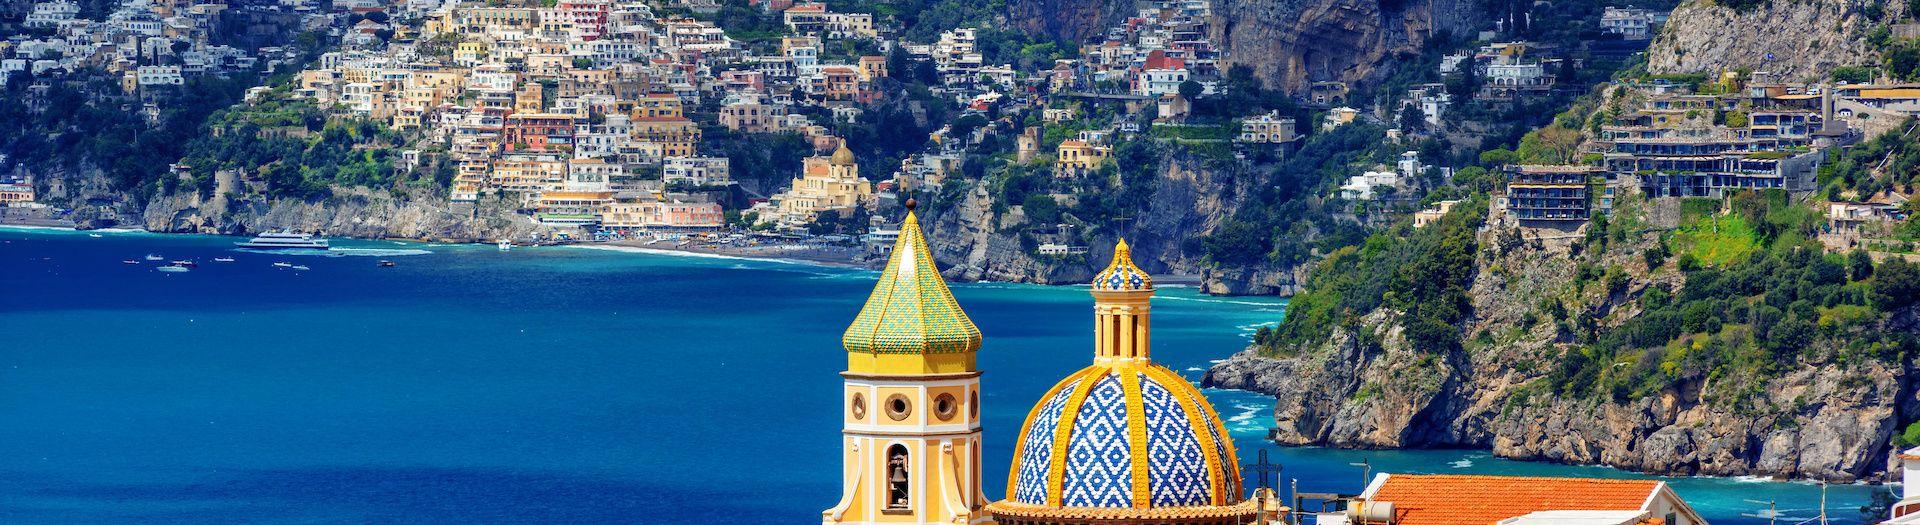 Amalfi Coast Page